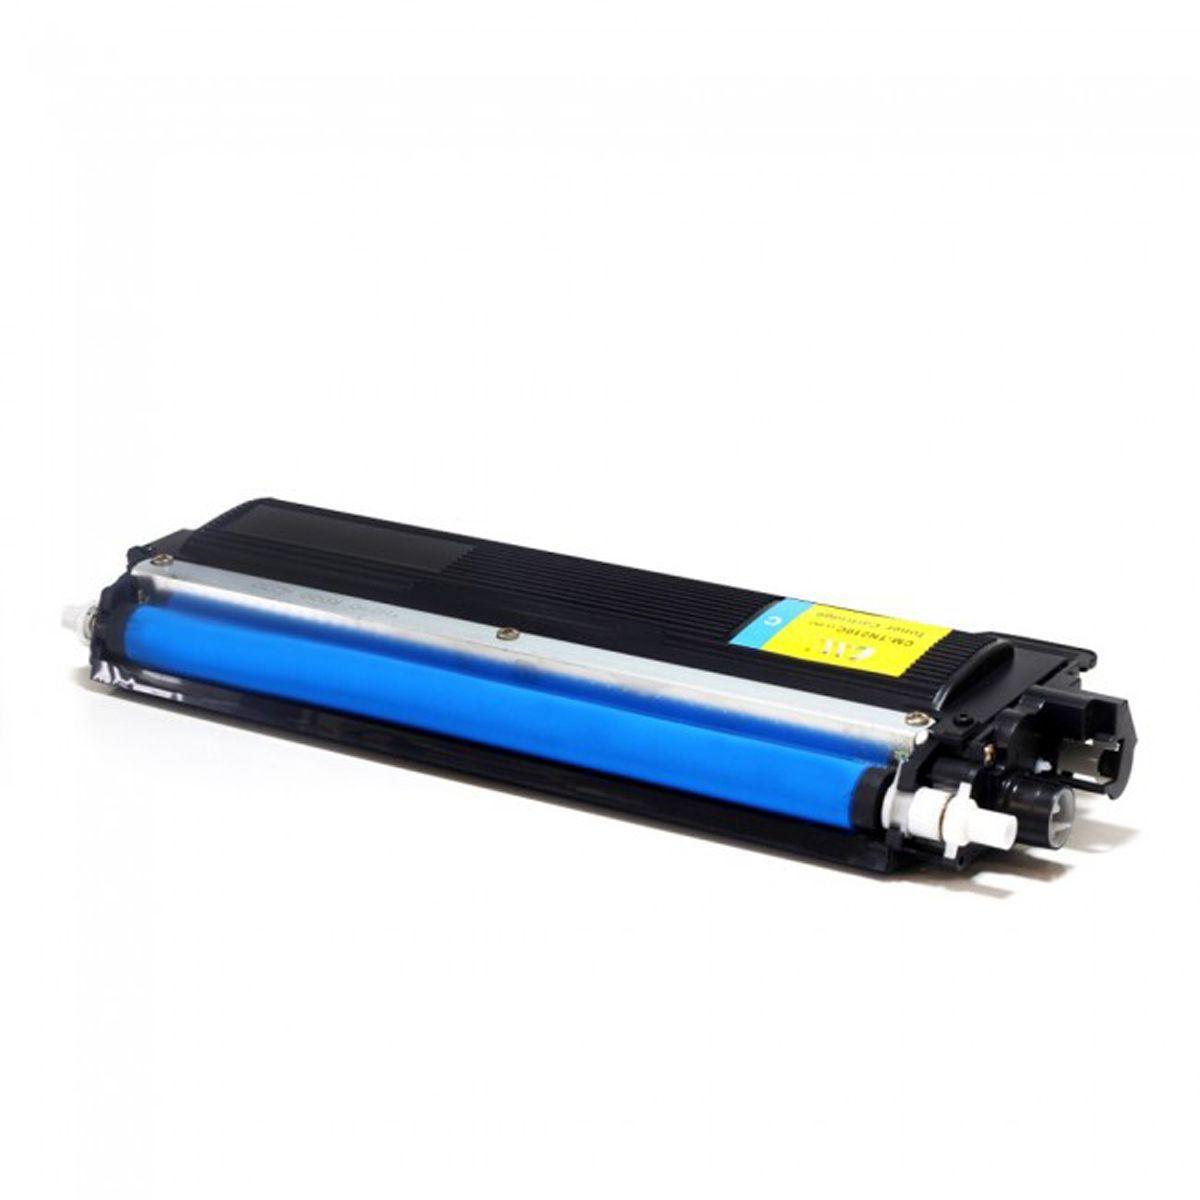 Toner Brother TN-210 TN210 - HL3040CN MFC9010CN HL3070CW MFC9120CN MFC9320Cw - Ciano - 1,4K